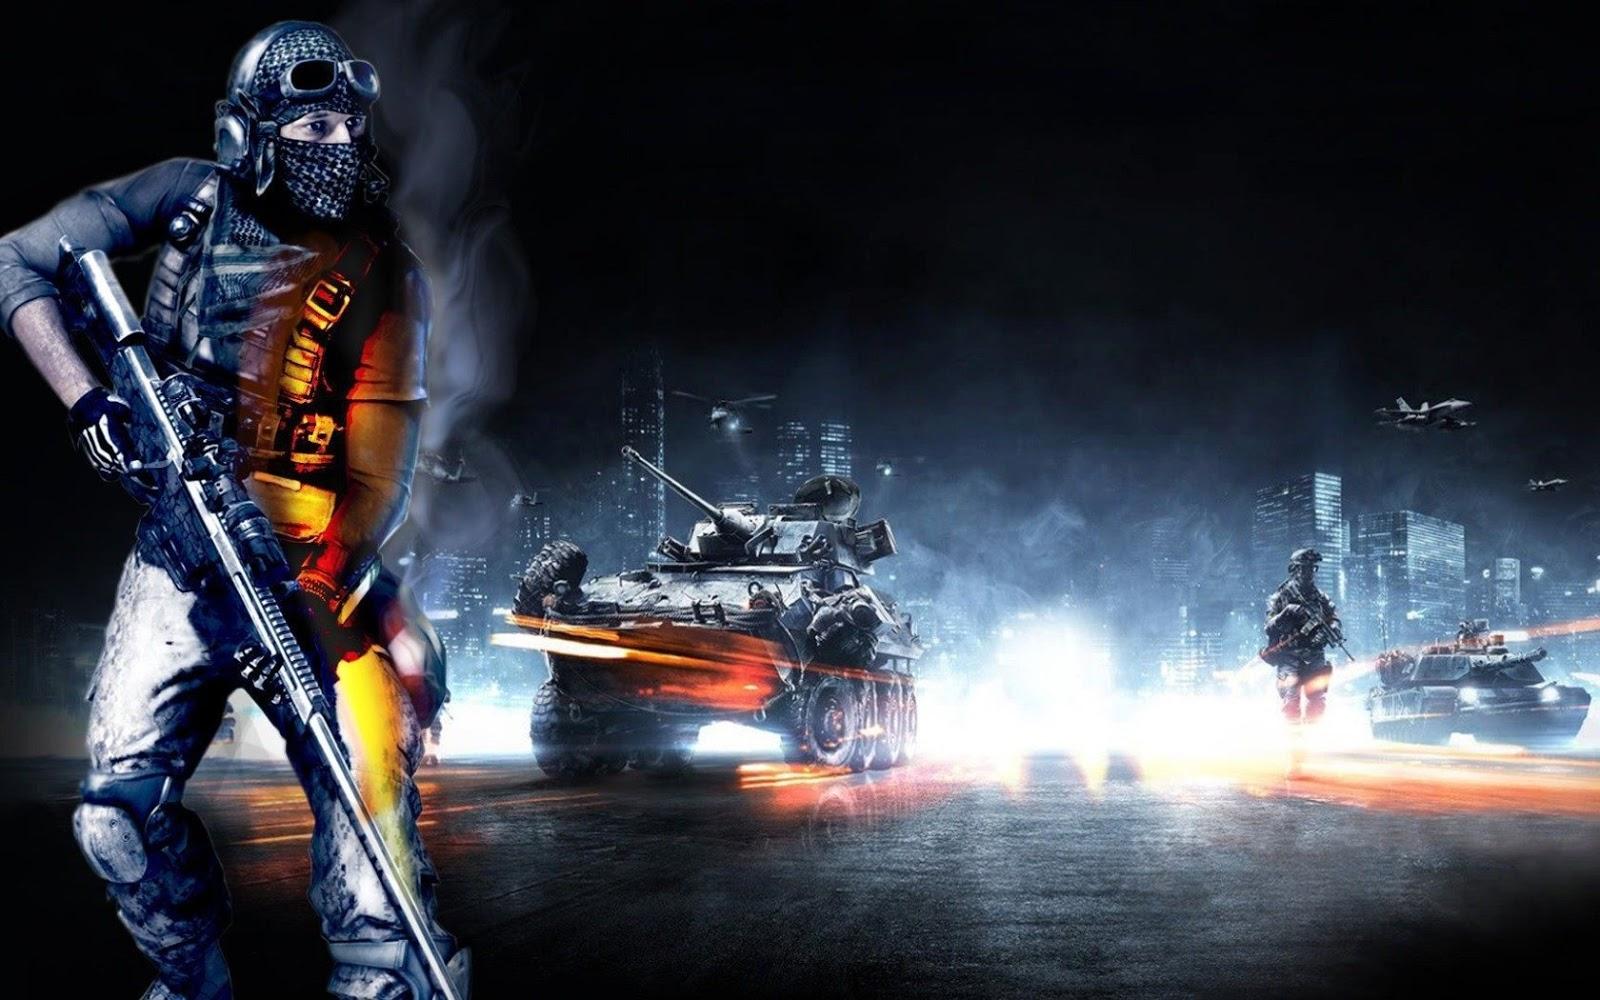 http://4.bp.blogspot.com/-7bSWcQXHtJs/Trveq5c_k9I/AAAAAAAAEUQ/gNWXN-v1Z9g/s1600/Battlefield_3_Commando_Tanks_Behind_HD_Wallpaper_Vvallpaper.Net.jpg